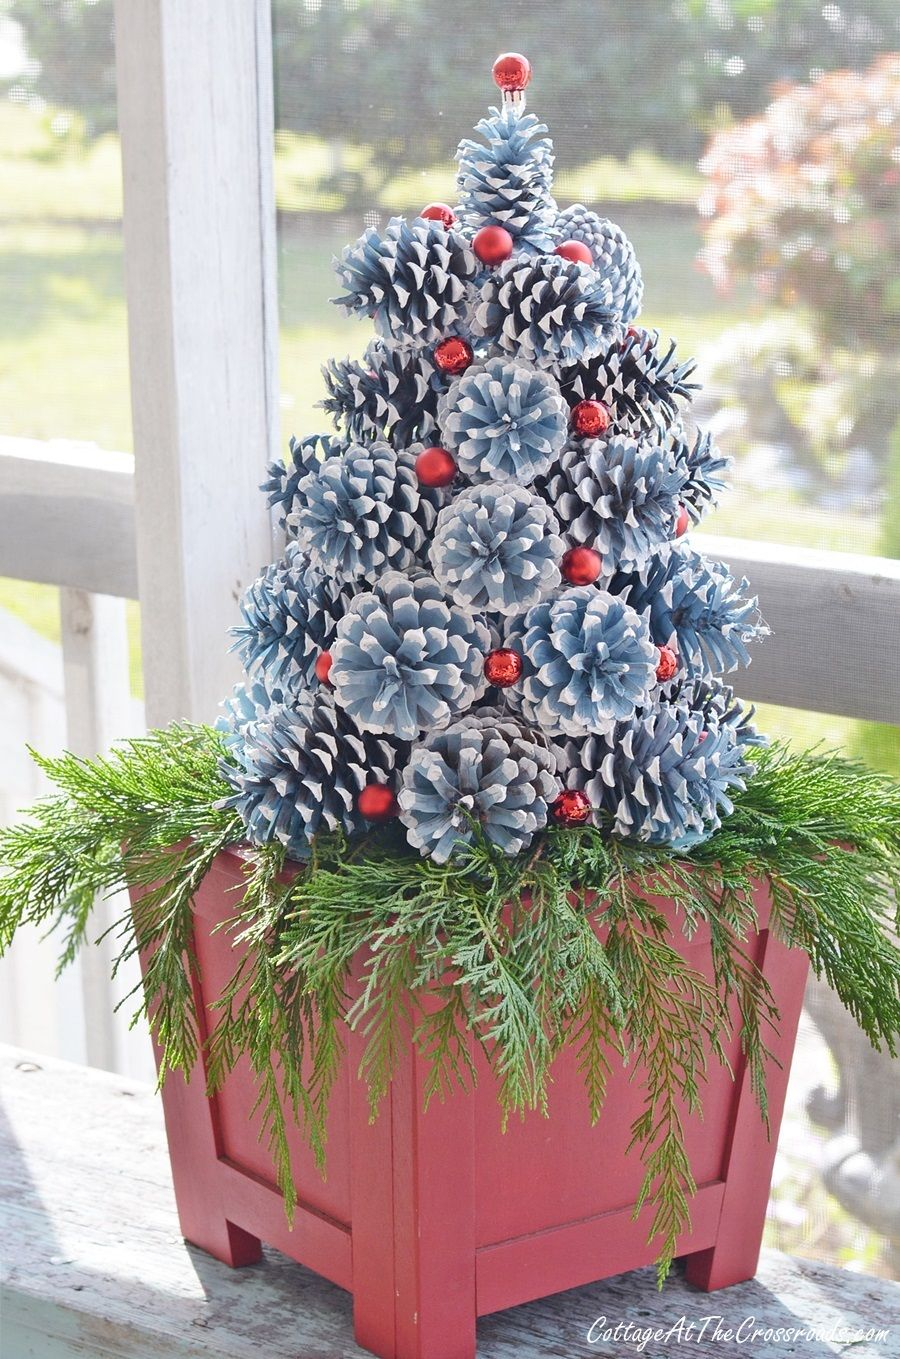 How to Make Pine Cone Christmas Trees | Pine cone christmas decorations, Diy christmas tree ...